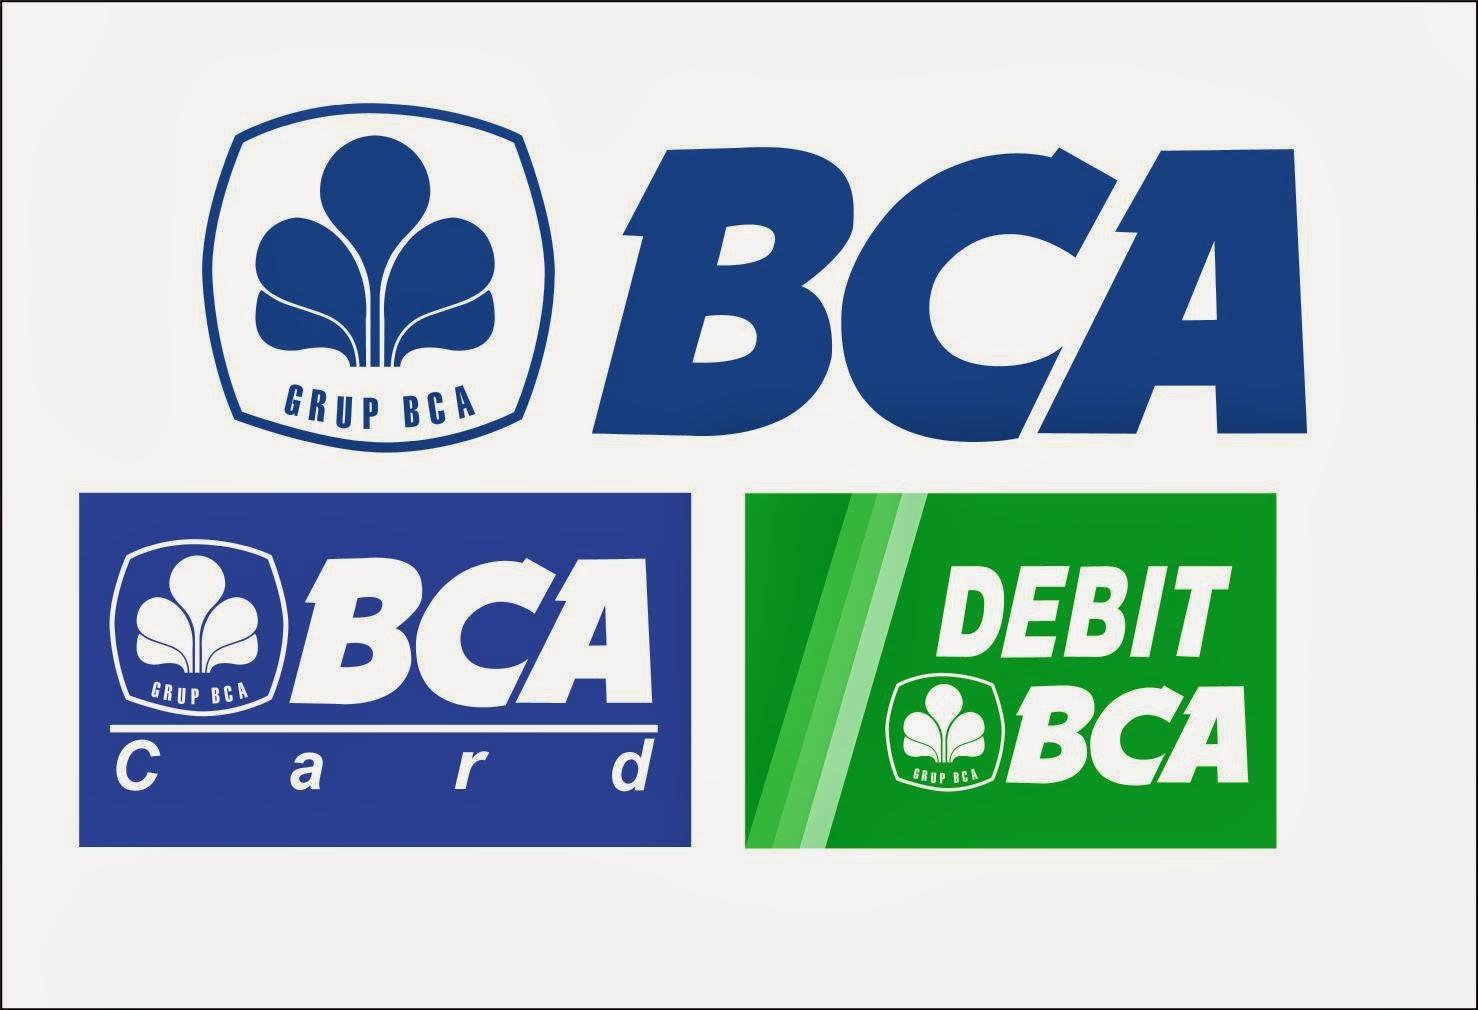 semangat sharing logo bca